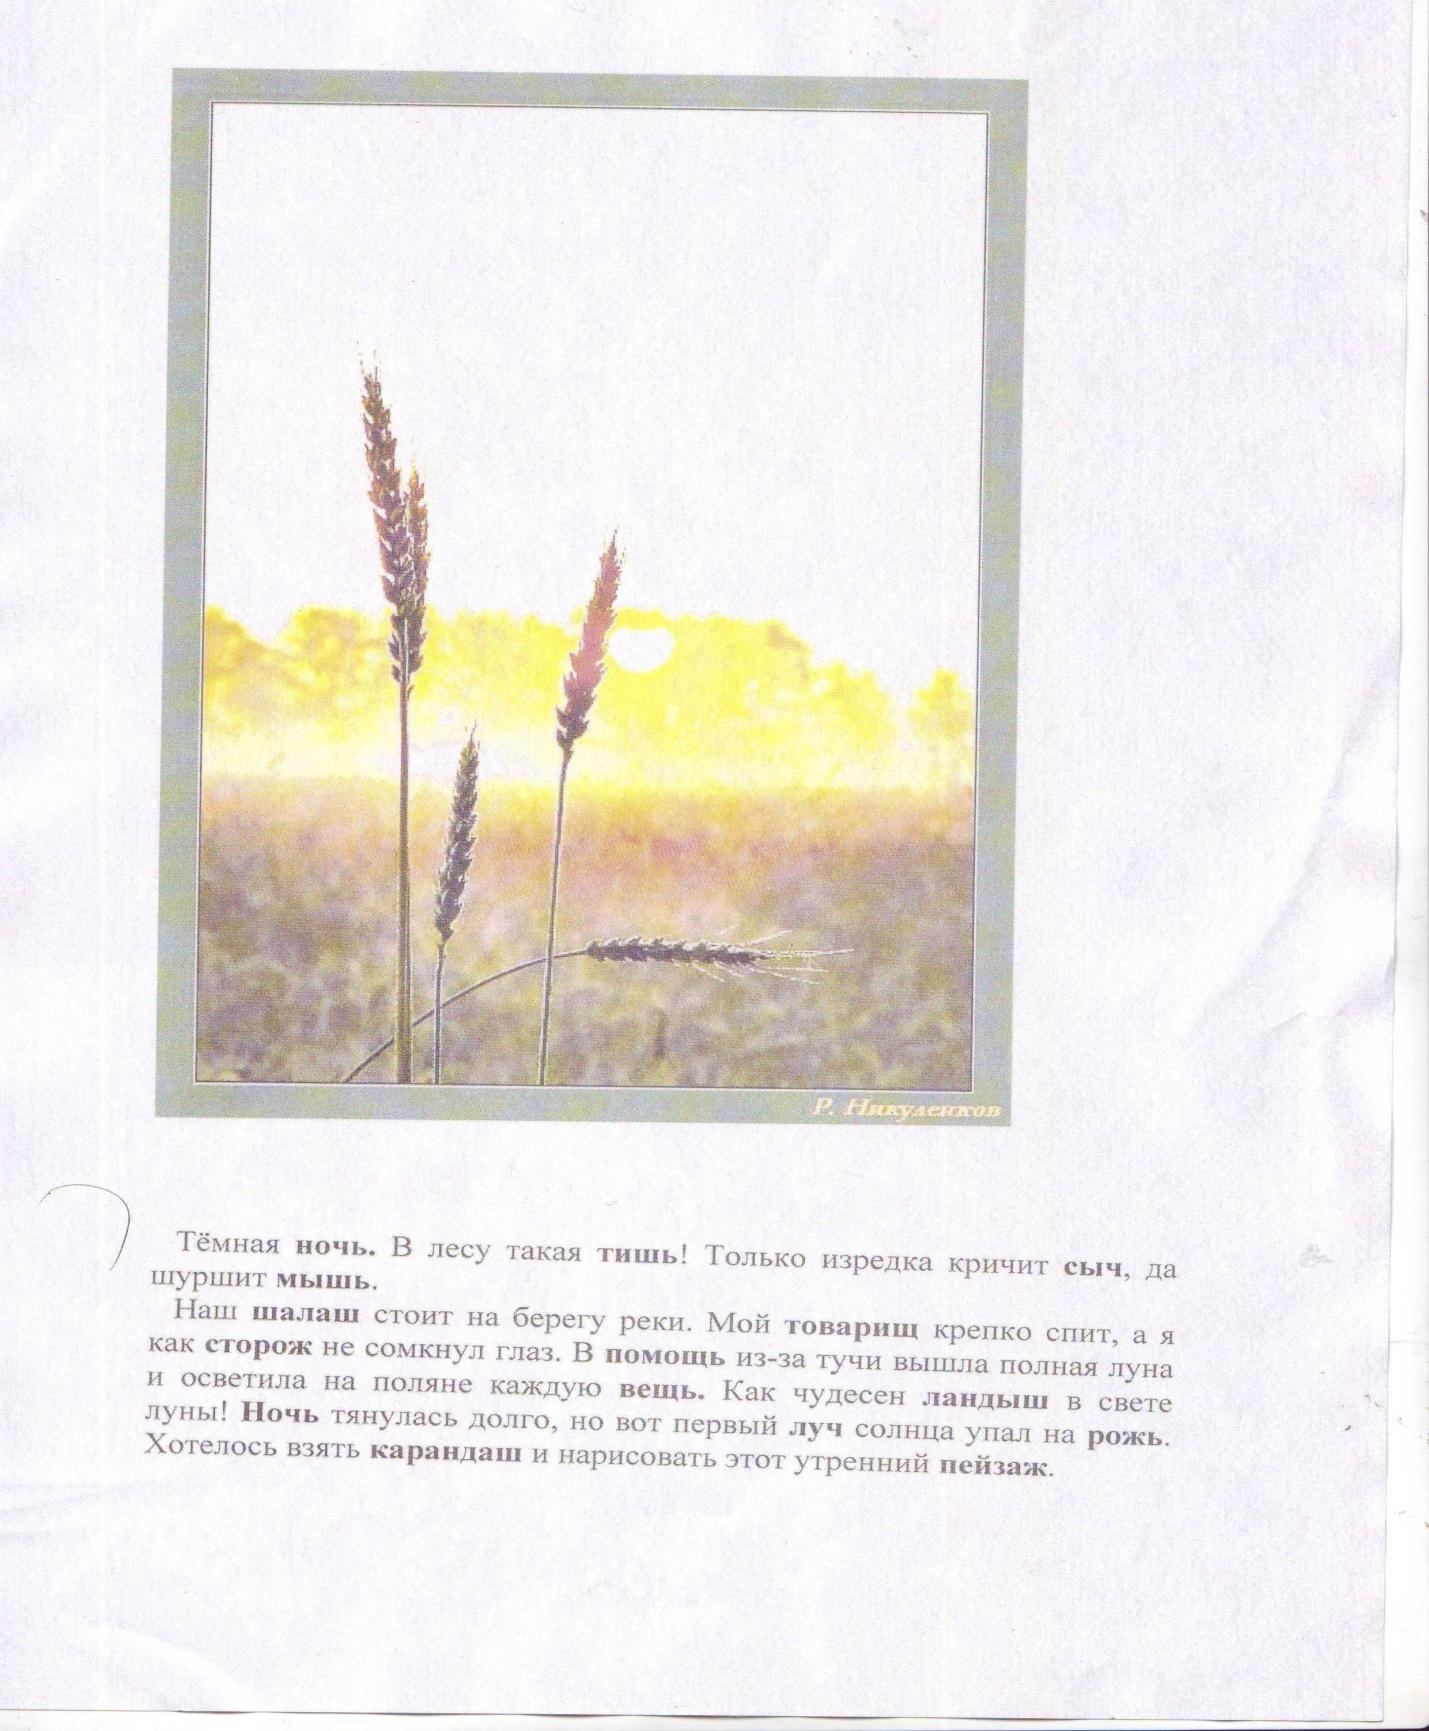 C:\Documents and Settings\Админ\Мои документы\2011-03-03\Image0052.JPG